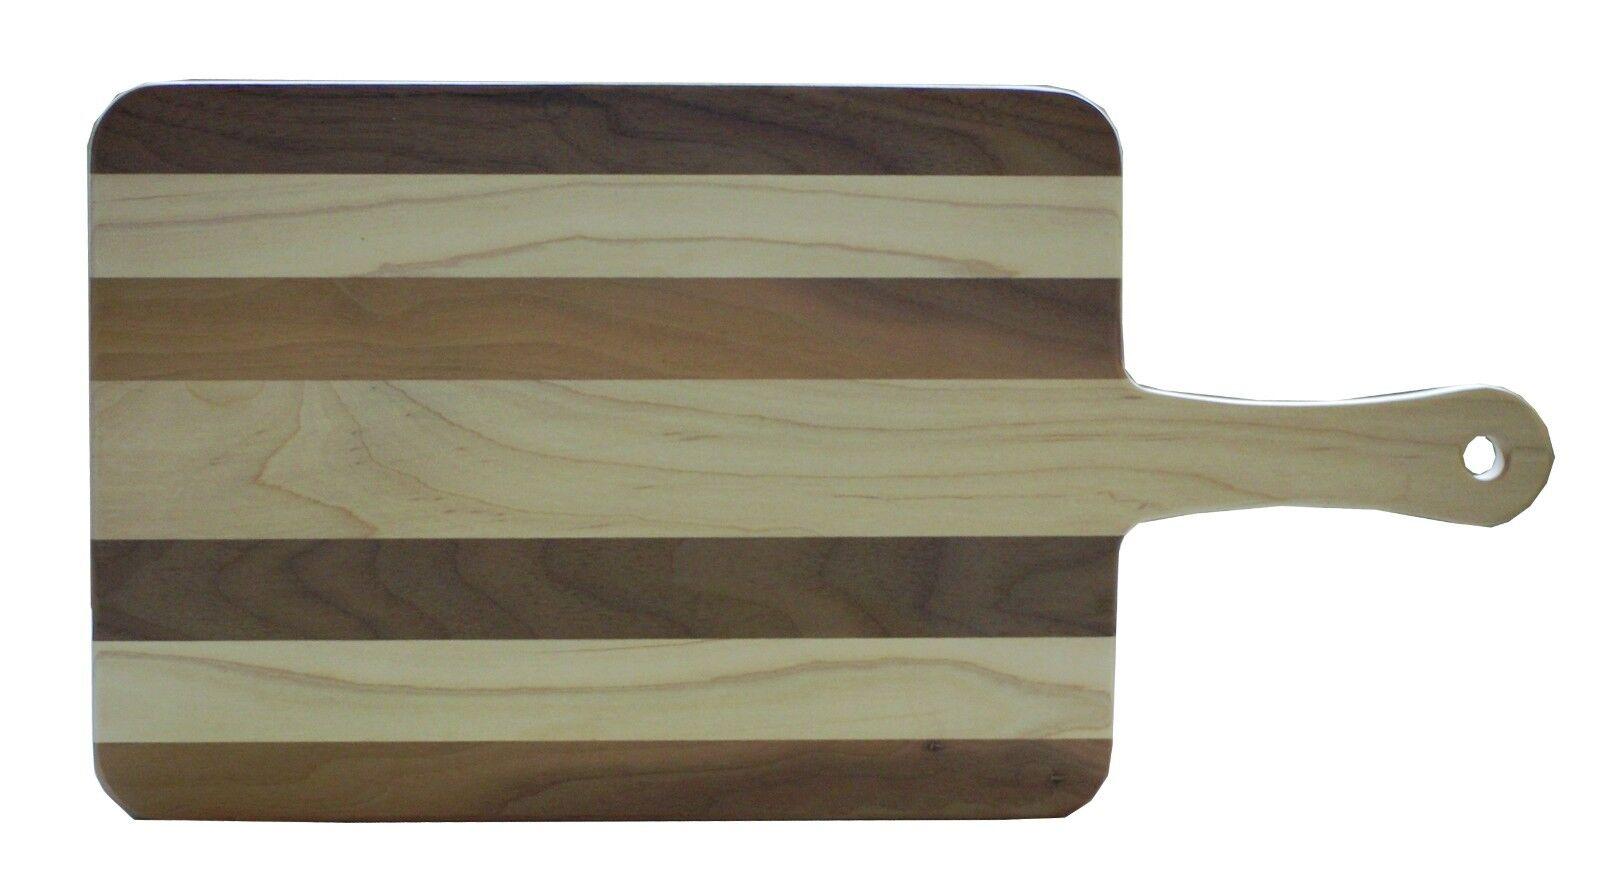 Walnut and Maple Wood Paddle Cutting Board - 2 Sizes - Kitchen - Amish Made USA